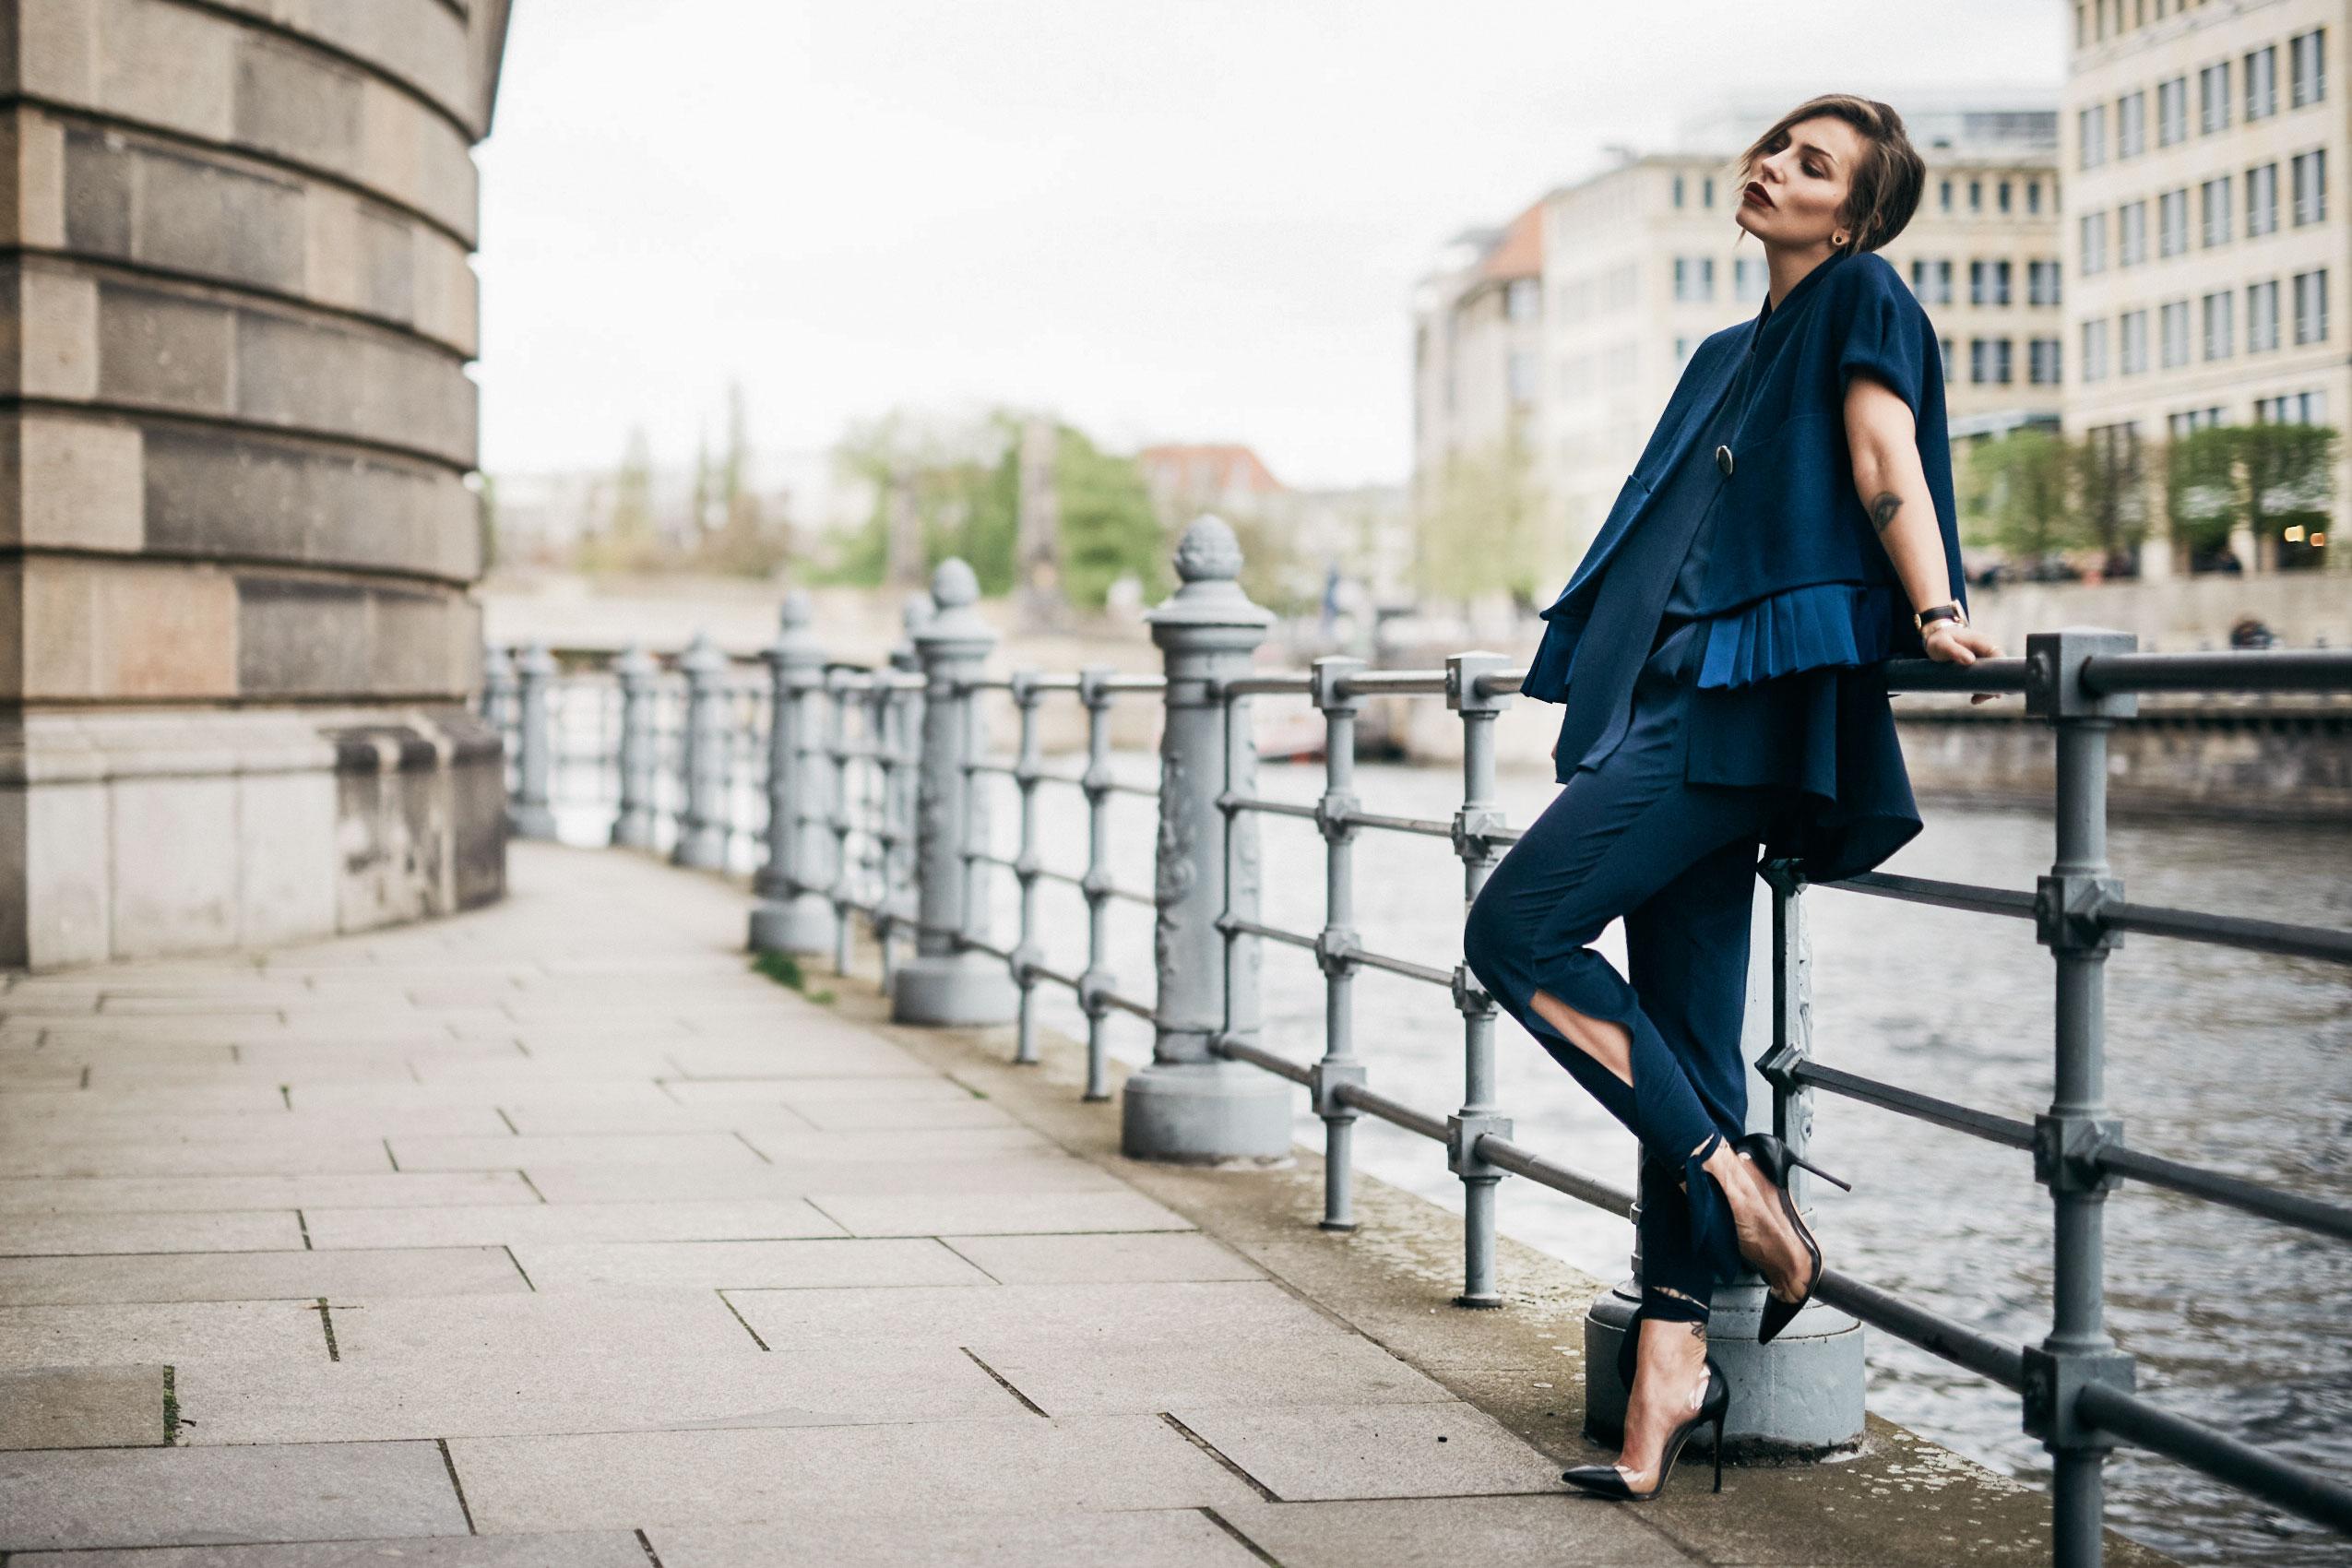 Masha Sedgwick, German newcomer Designer Nobi Talai, How to do layering, Berlin, Outfit, Fashion, style: feminine, oversized, dark blue, silk, layers, arab, nomad